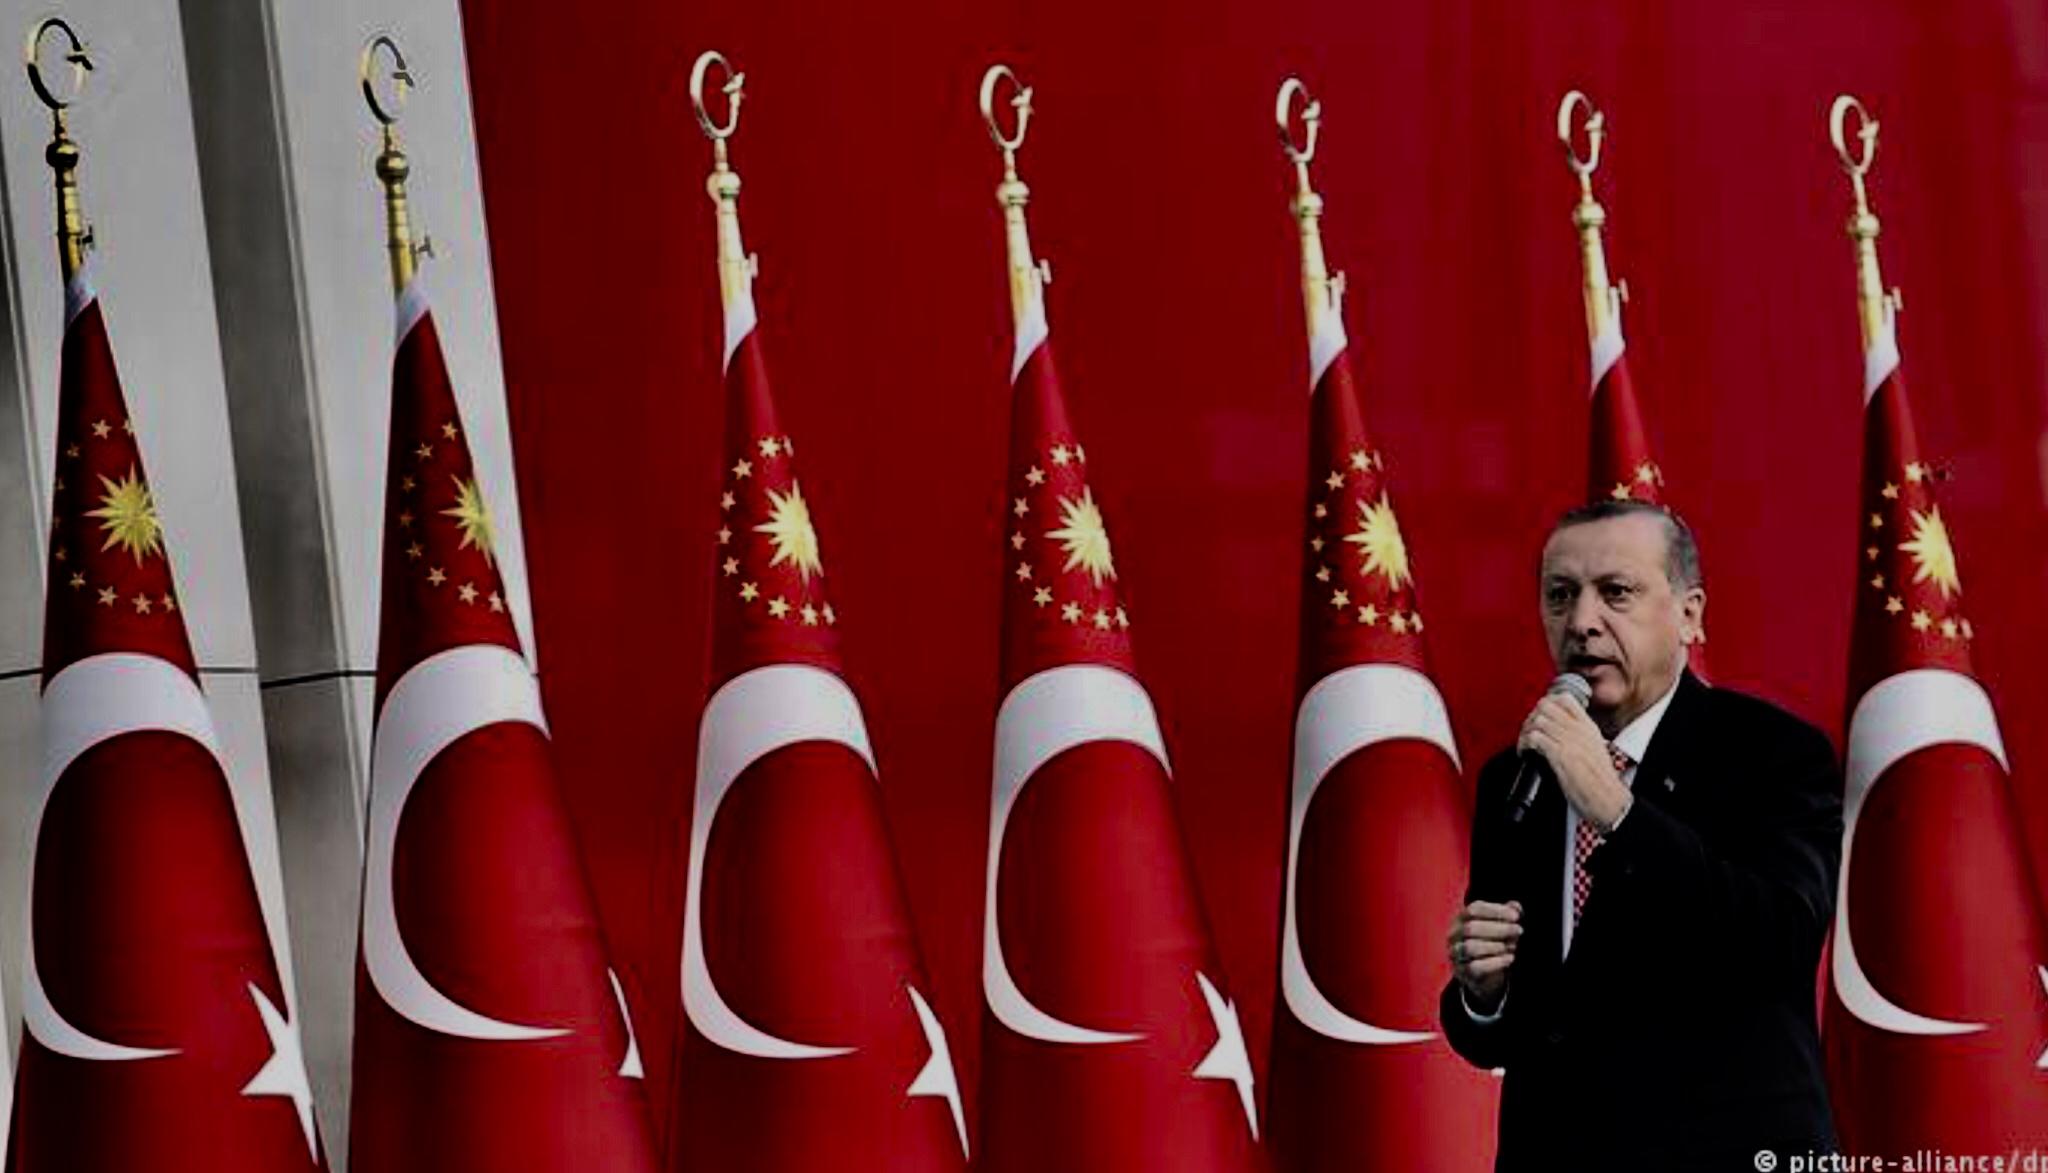 DW-Τι έγραψε ο ευρωπαϊκός Τύπος για τον Ερντογαν «Ο σουλτάνος έχει χρεοκοπήσει»